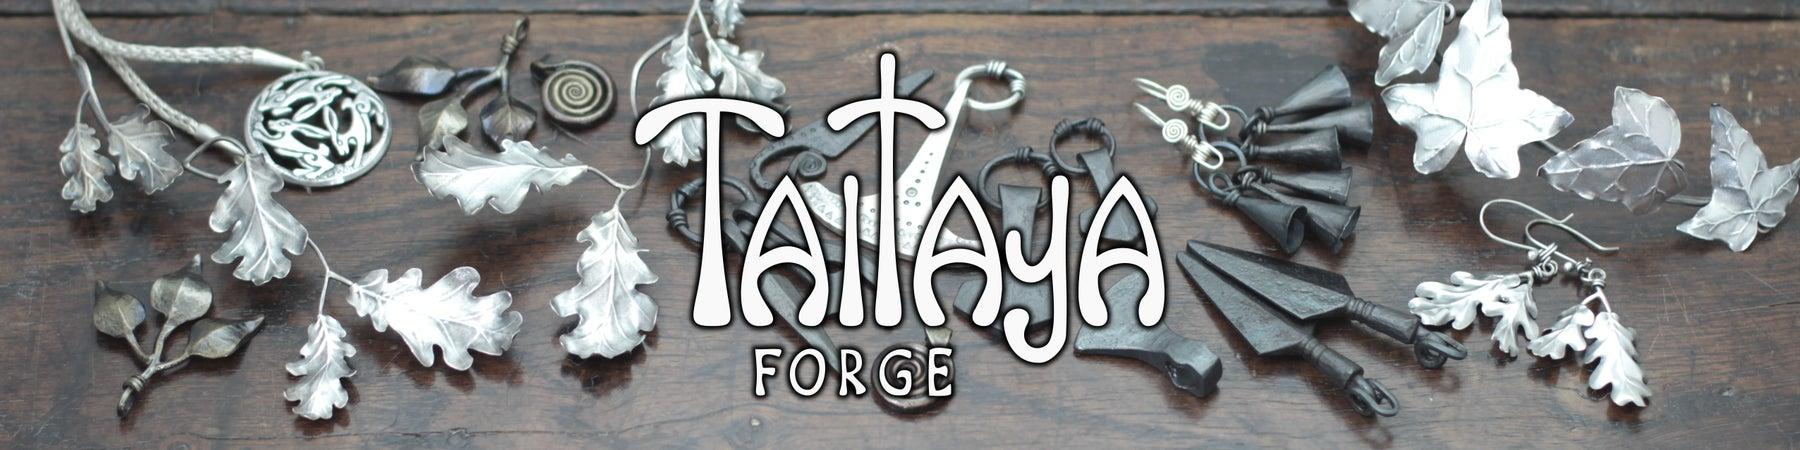 Taitaya Forge